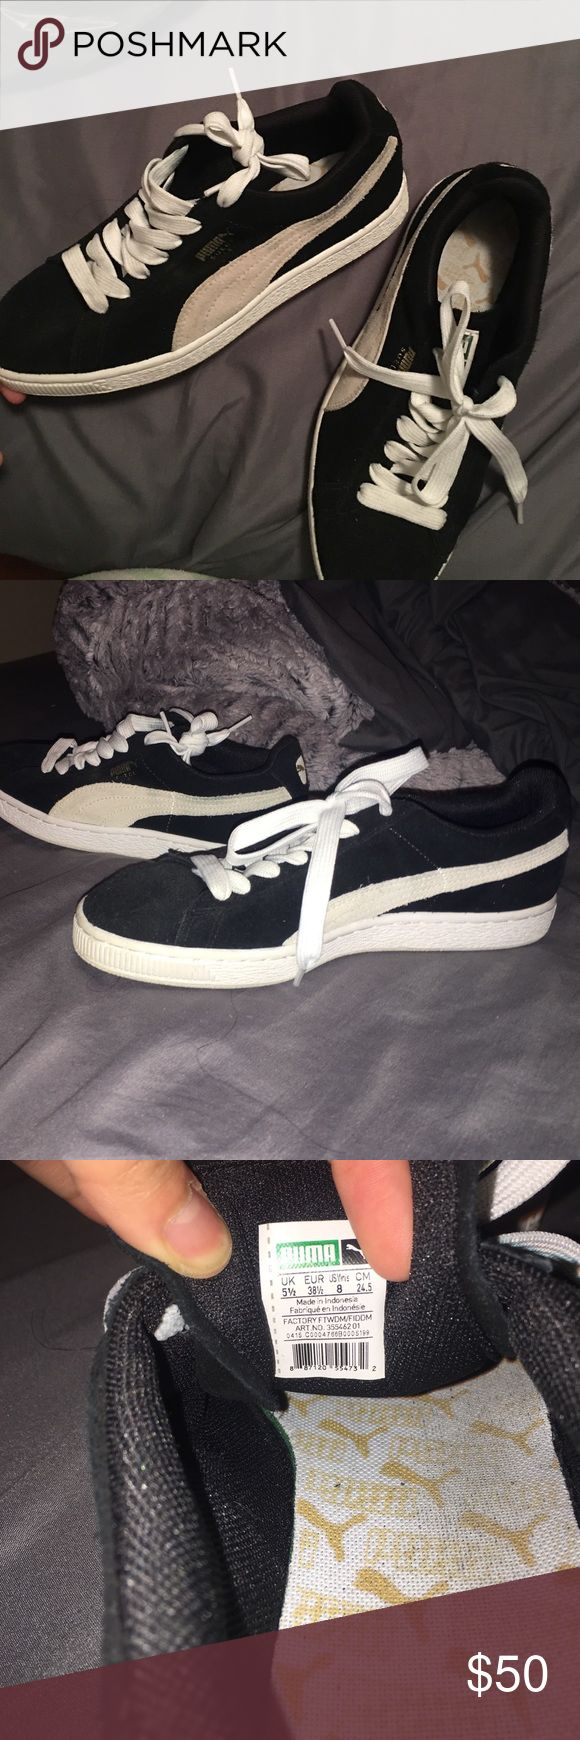 Black & white suede Pumas 9.5/10 condition ! pumas suede ! very comfy. True to size! PUMAS Shoes Sneakers